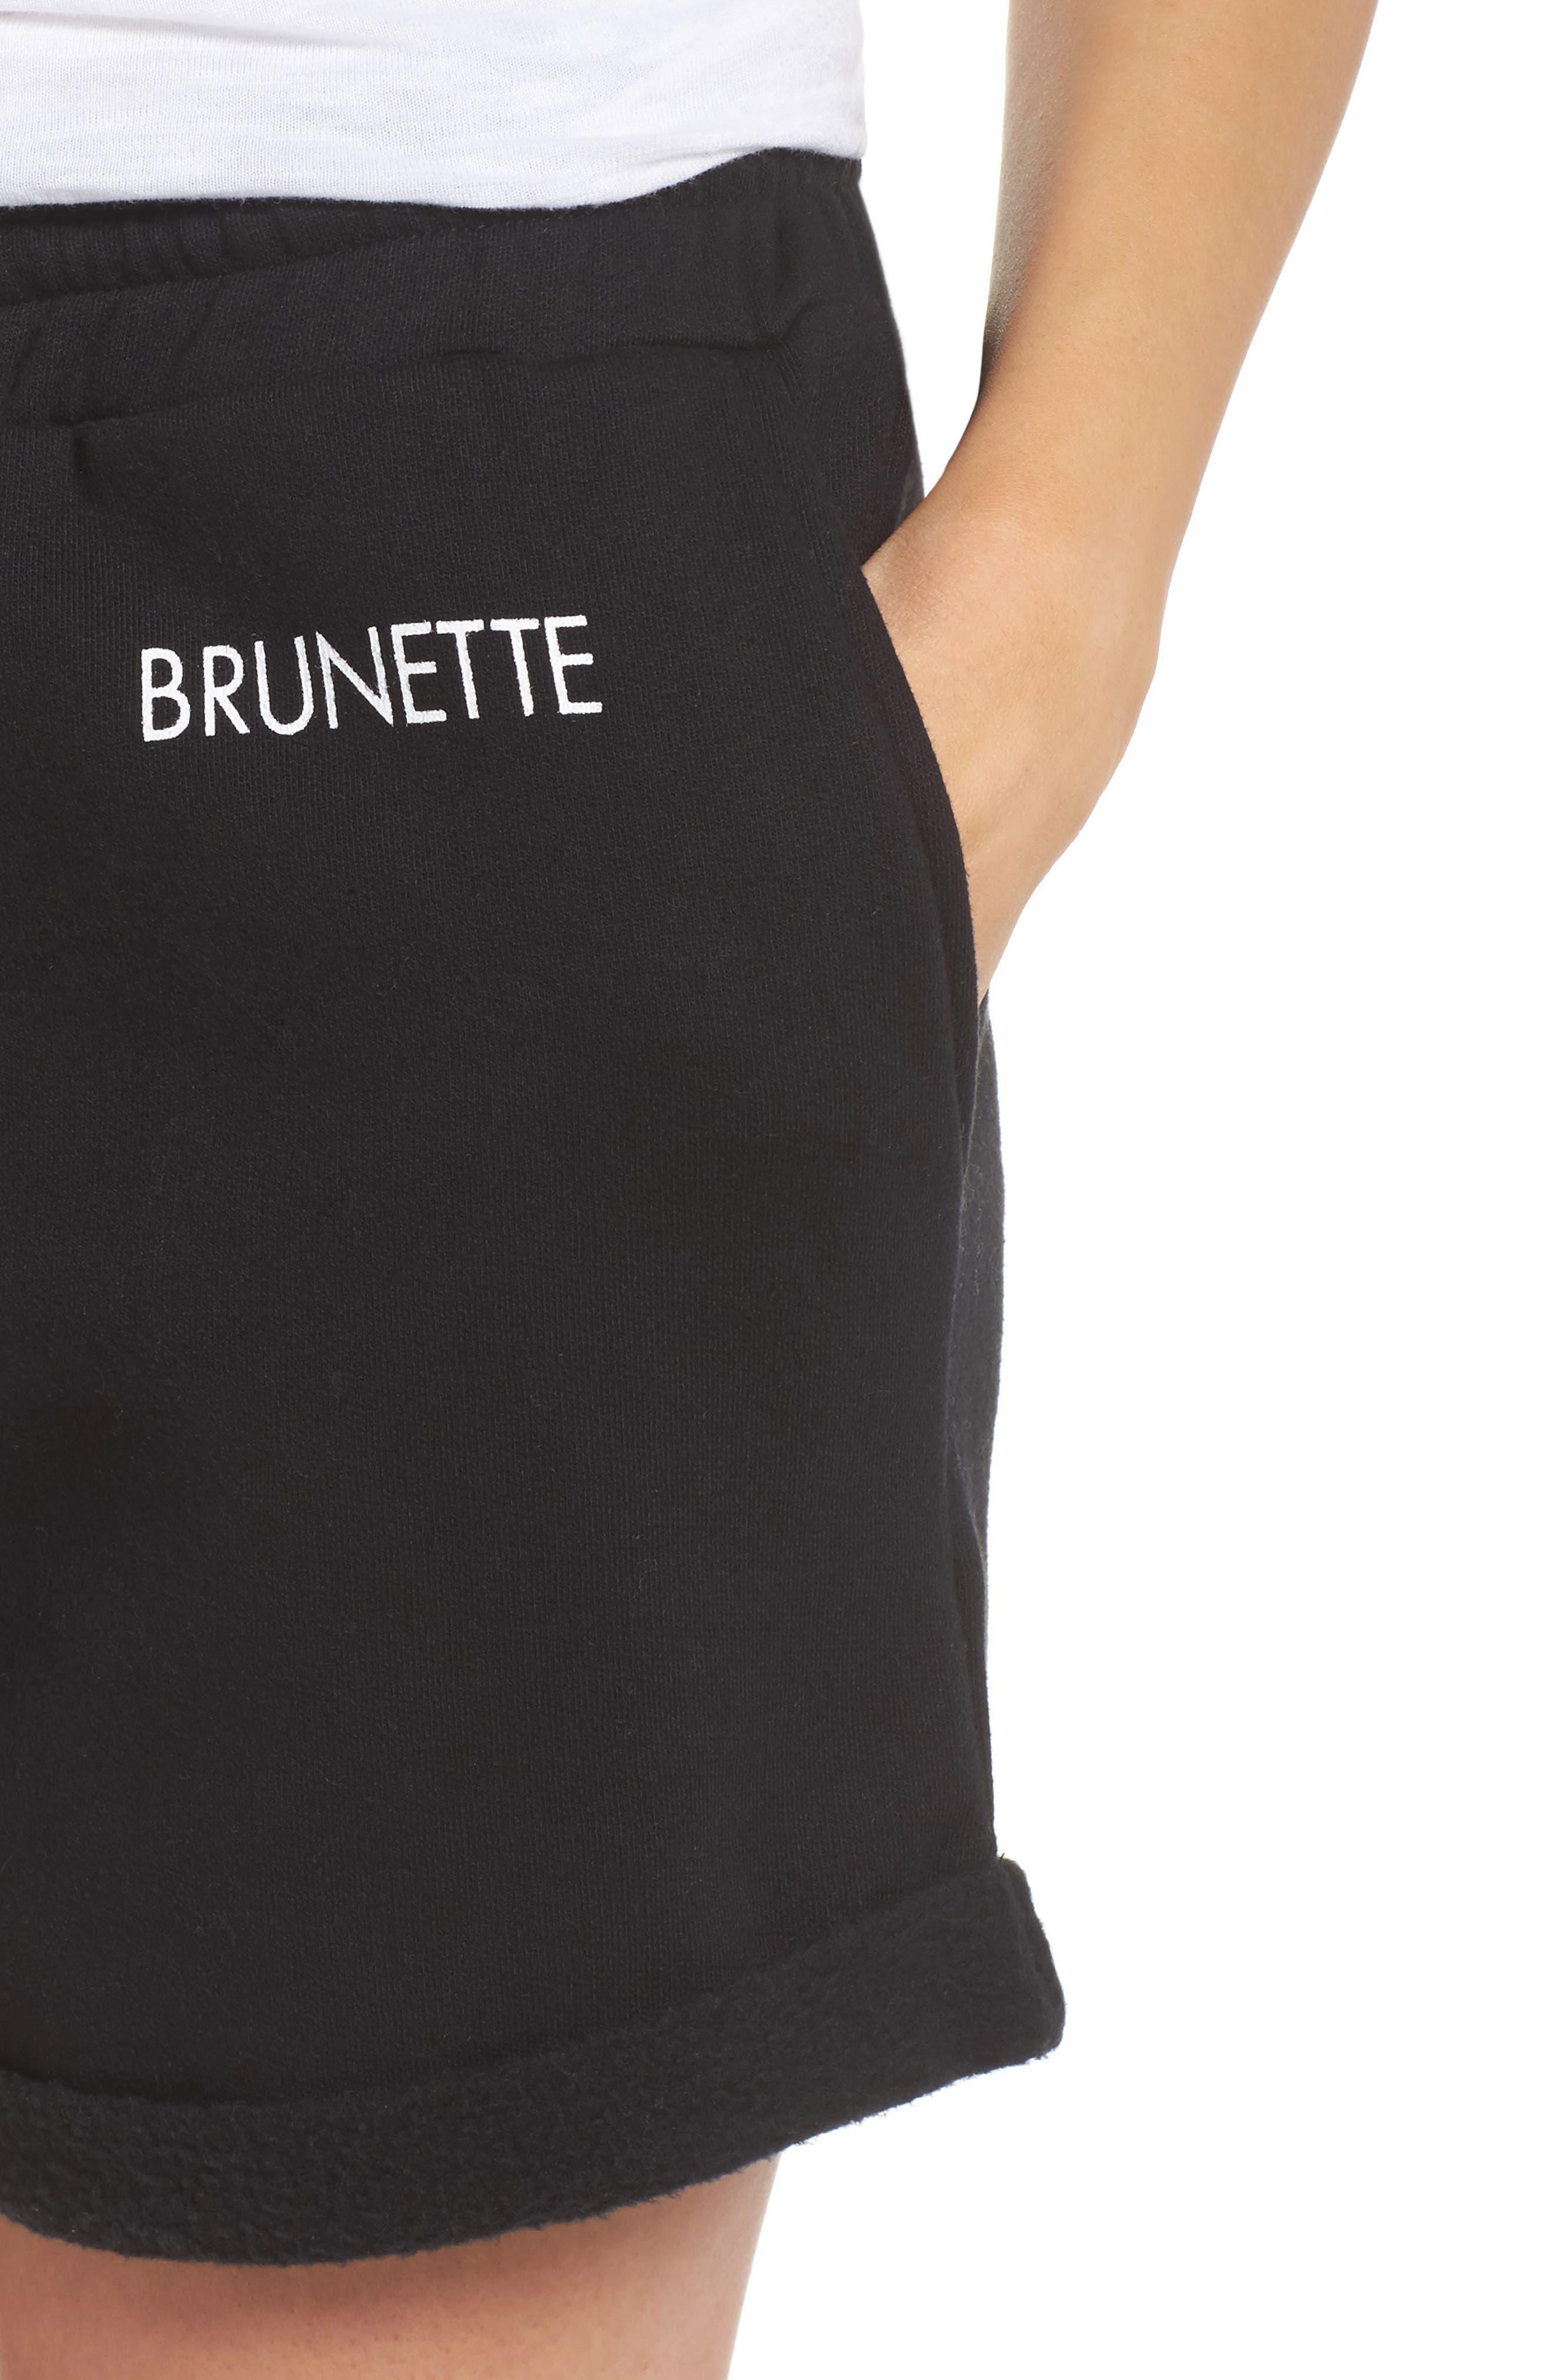 Brunette Shorts,                             Alternate thumbnail 6, color,                             Black